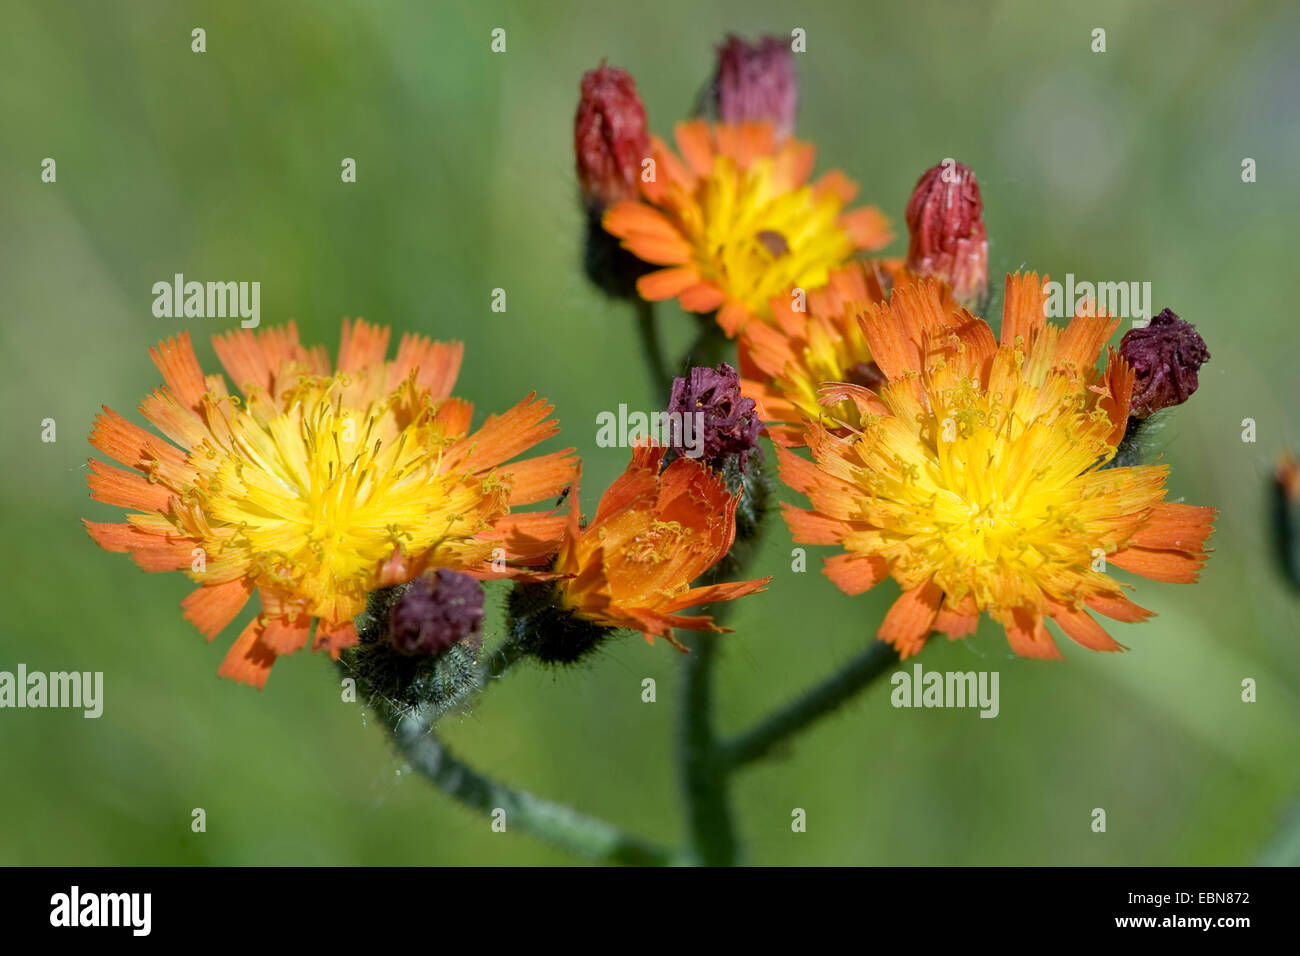 grim-the-collier, orange hawkweed (Hieracium aurantiacum), blooming, Germany - Stock Image